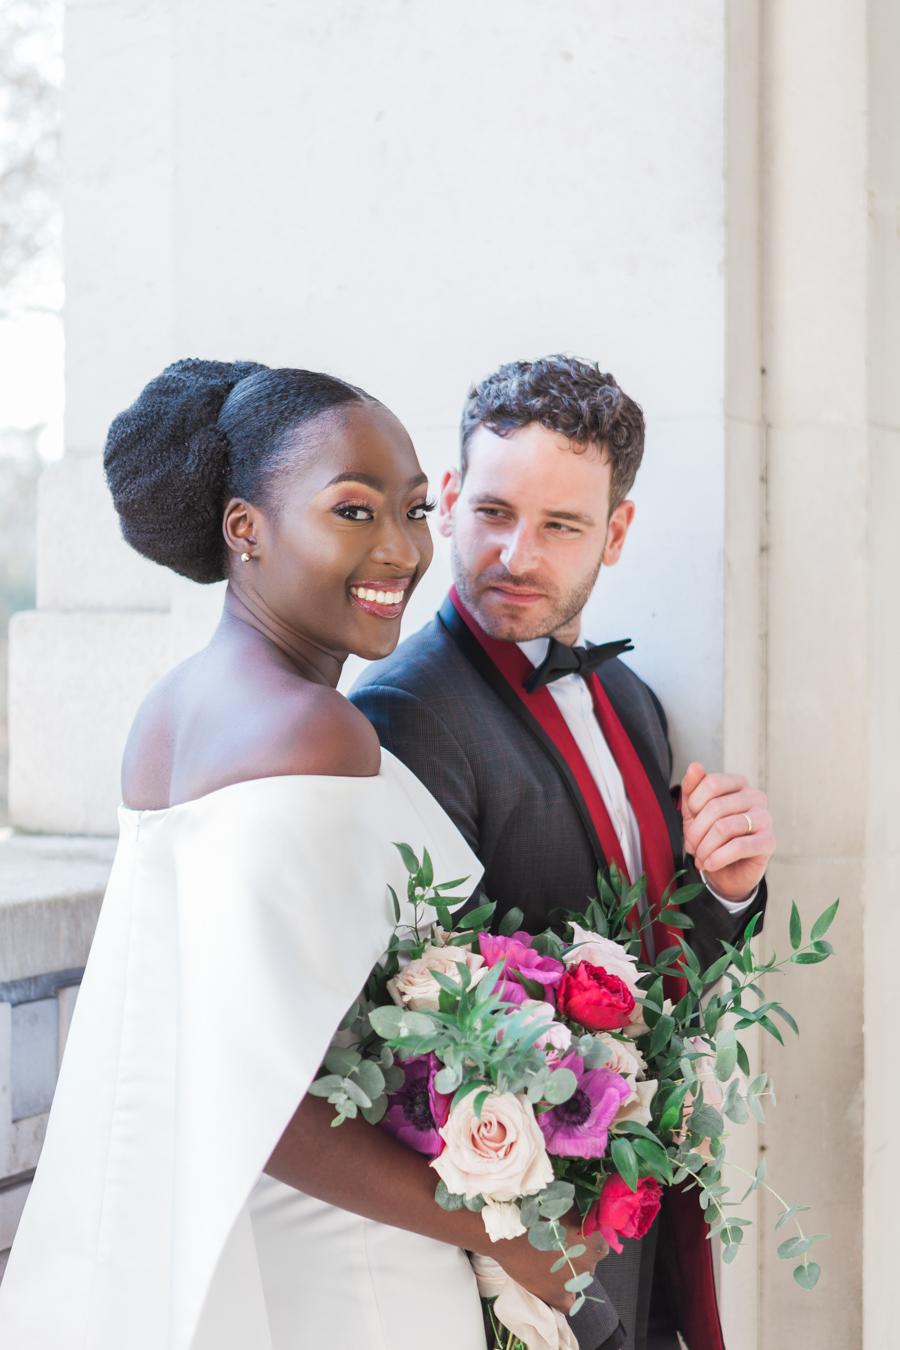 Breathtakingly beautiful - diversity wins in this stunning RSA London wedding editorial! (4)